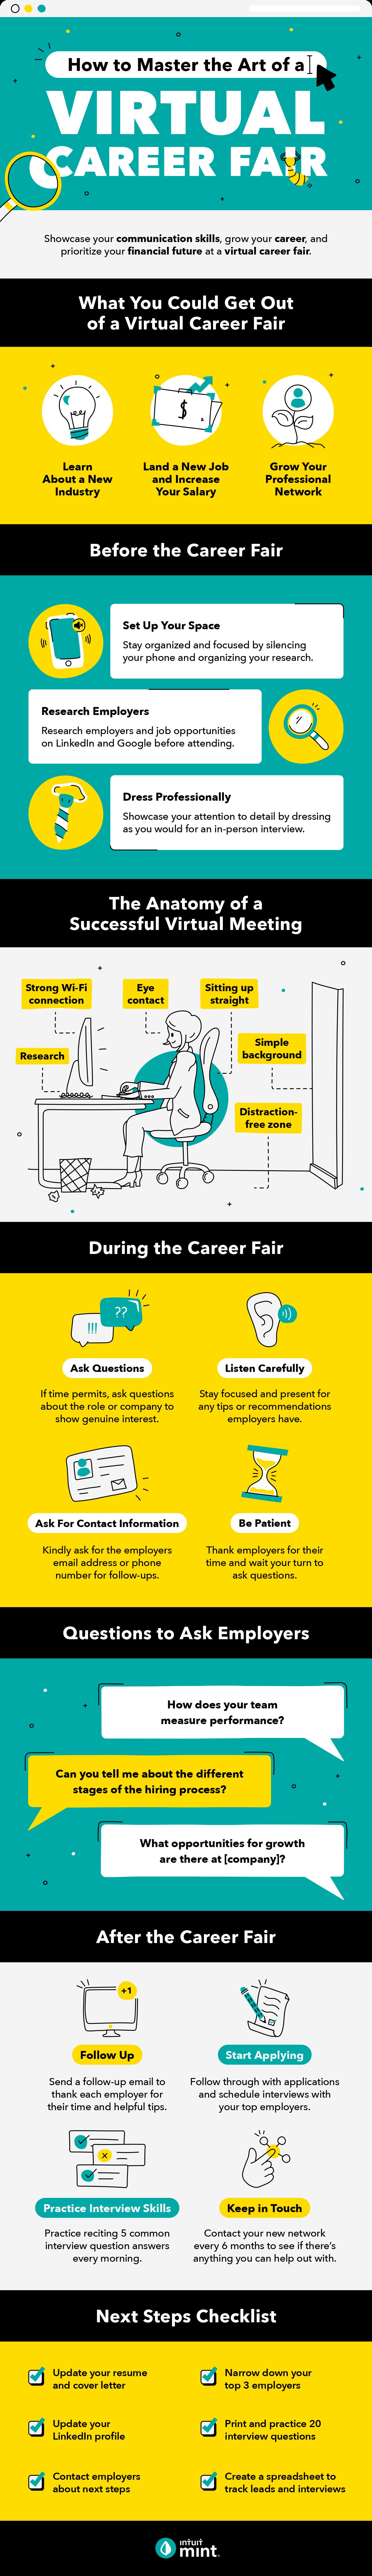 How to Master the Art of a Virtual Career Fair